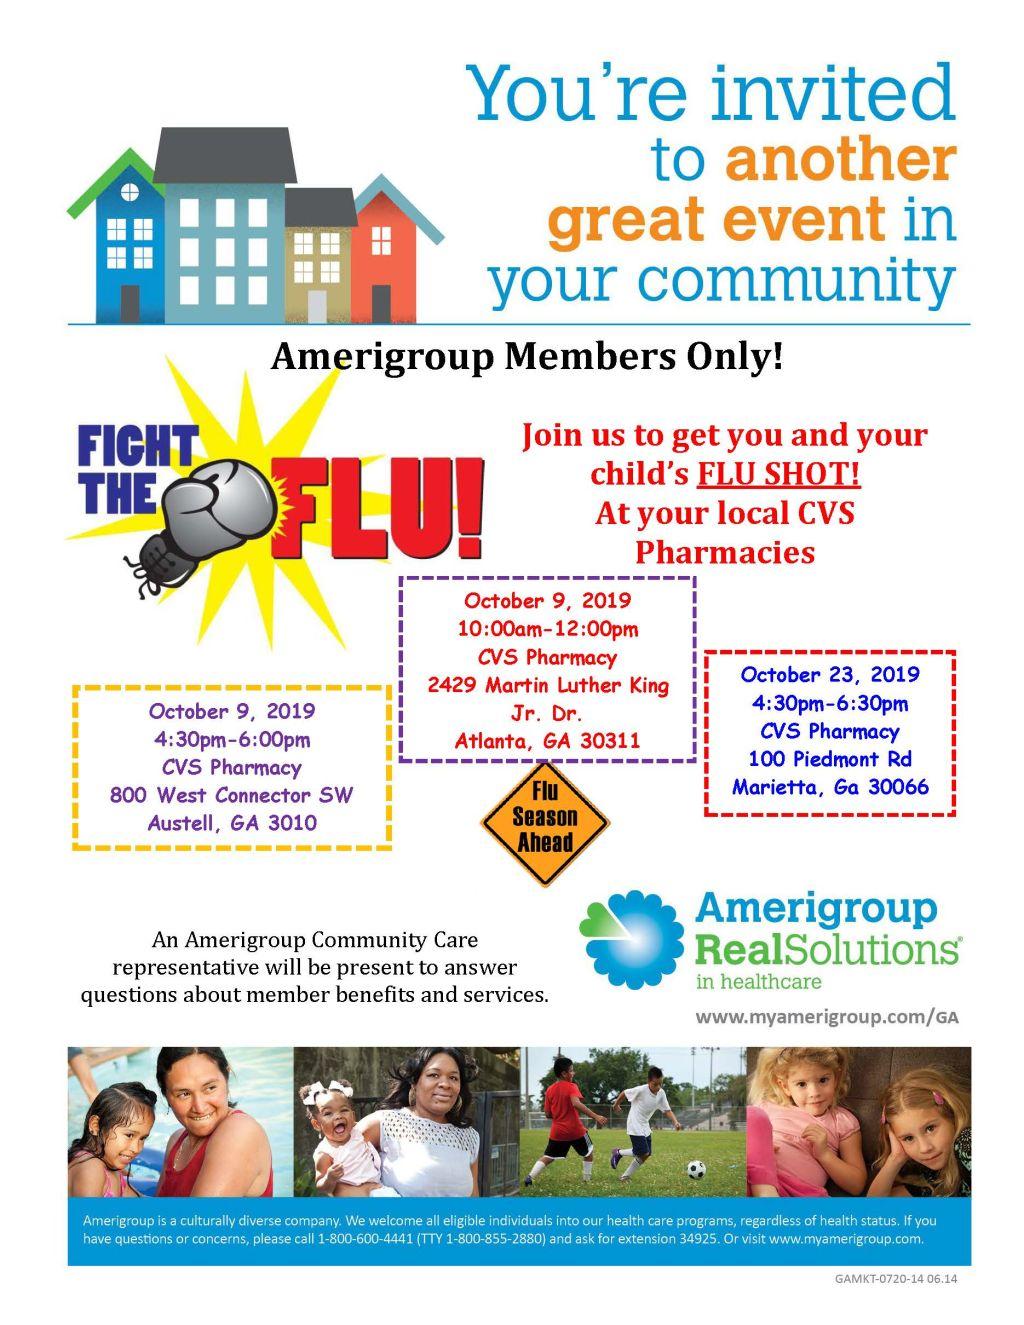 Amerigroup: Fight the Flu